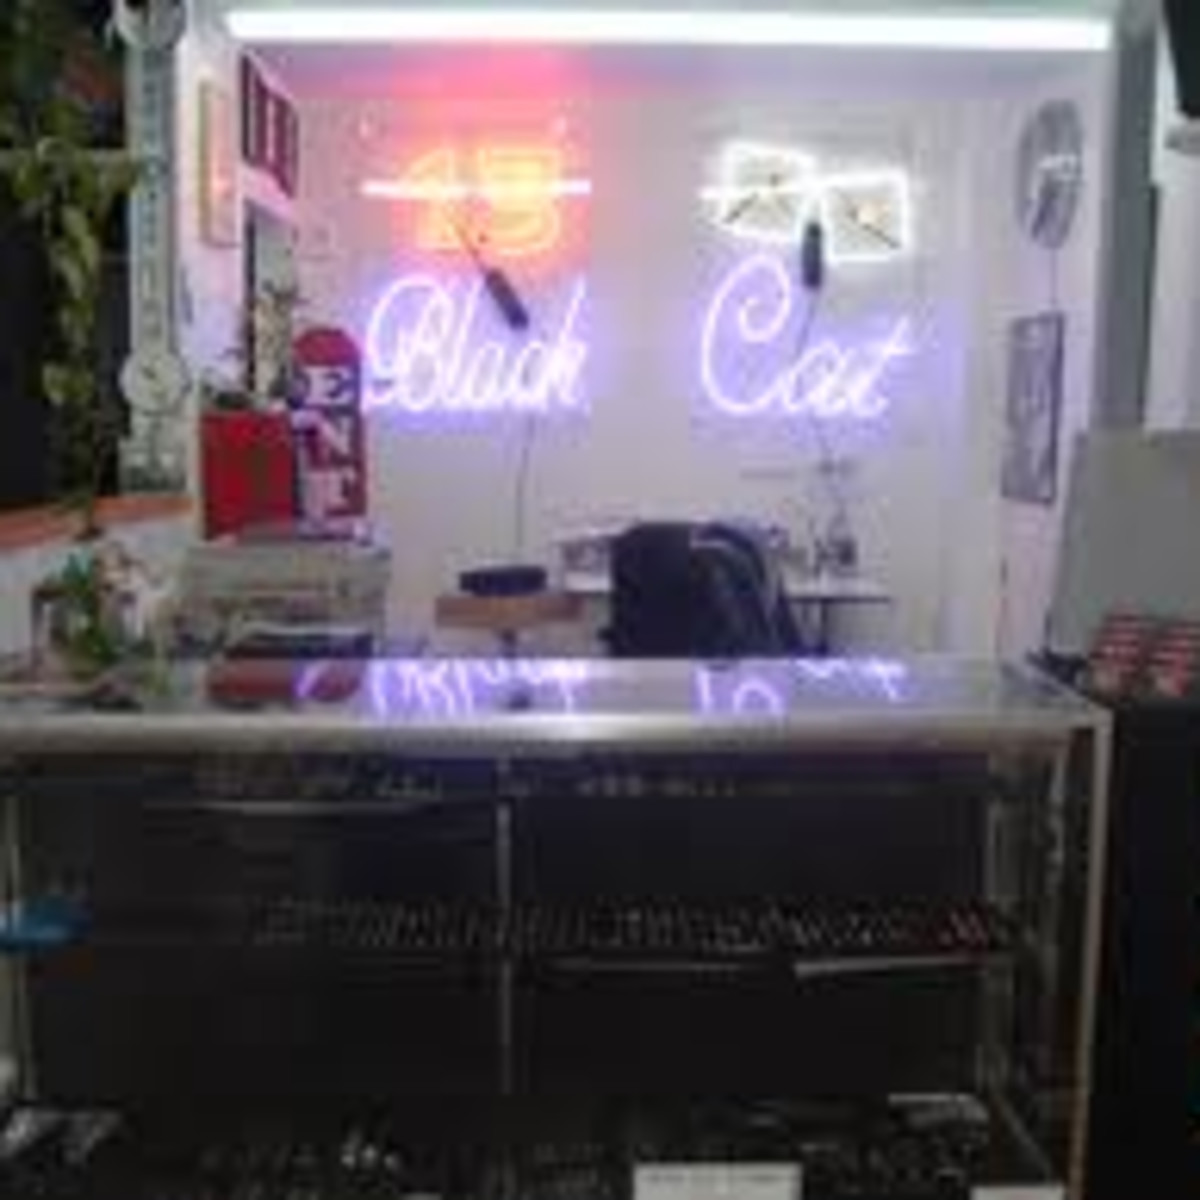 Austin_photo: places_shopping_black cat tattoo_interior